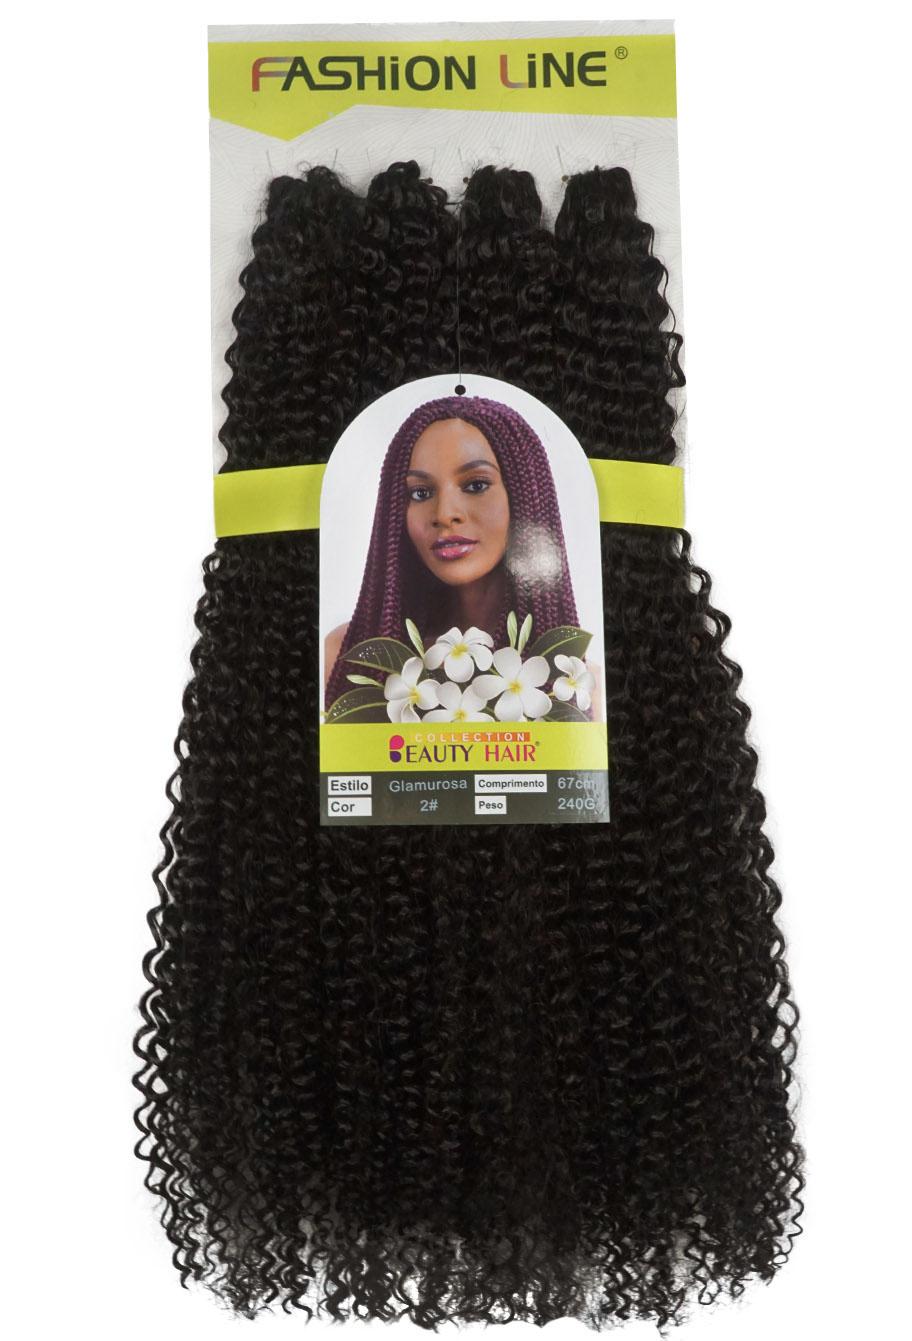 Cabelo Orgânico - Fashion Line Crochet Braid - Glamurosa